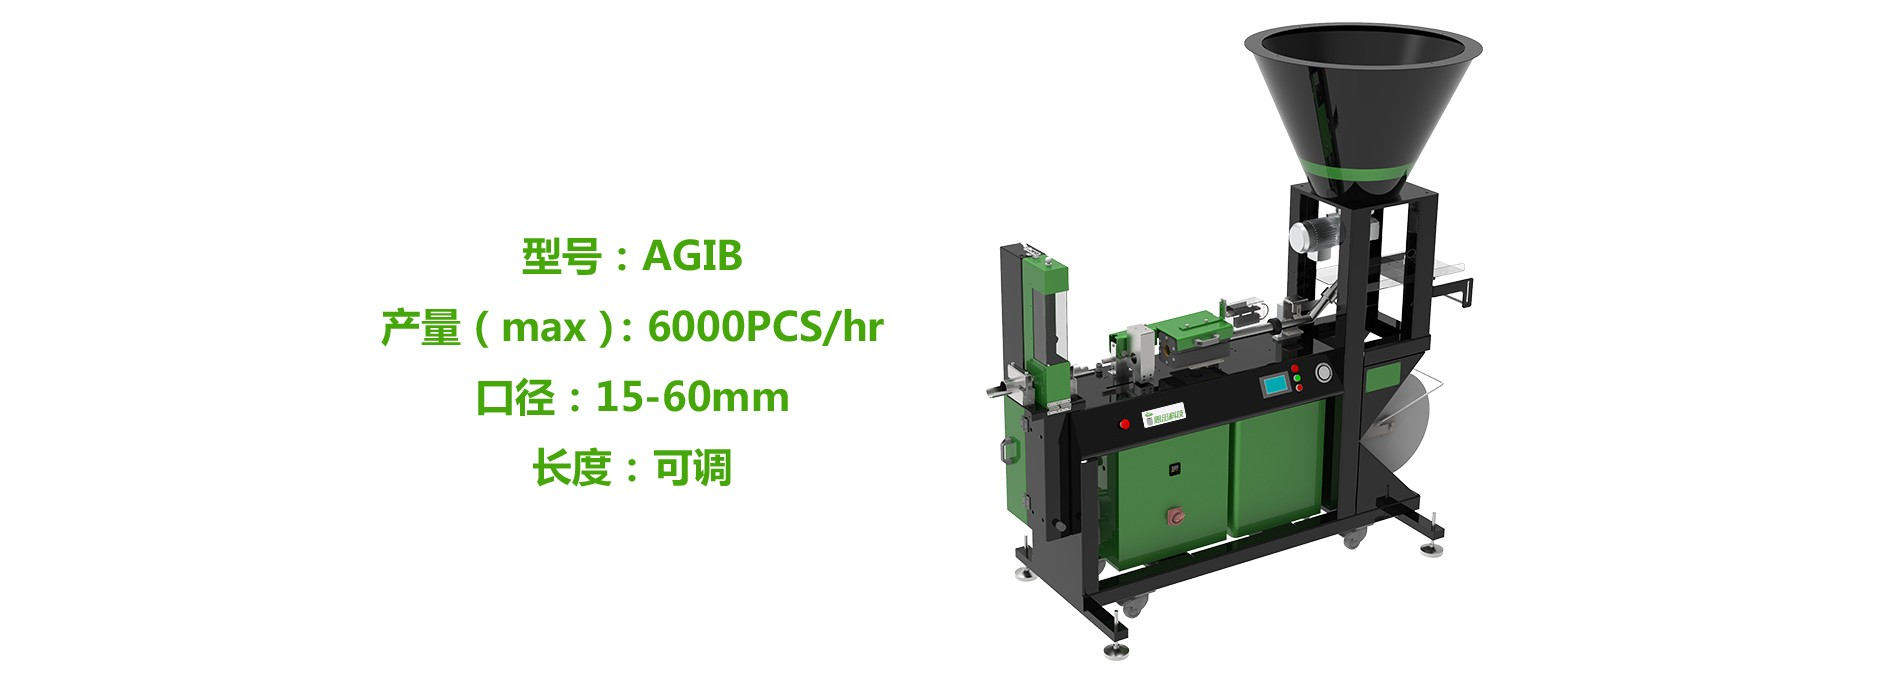 AGIB(网站)-2